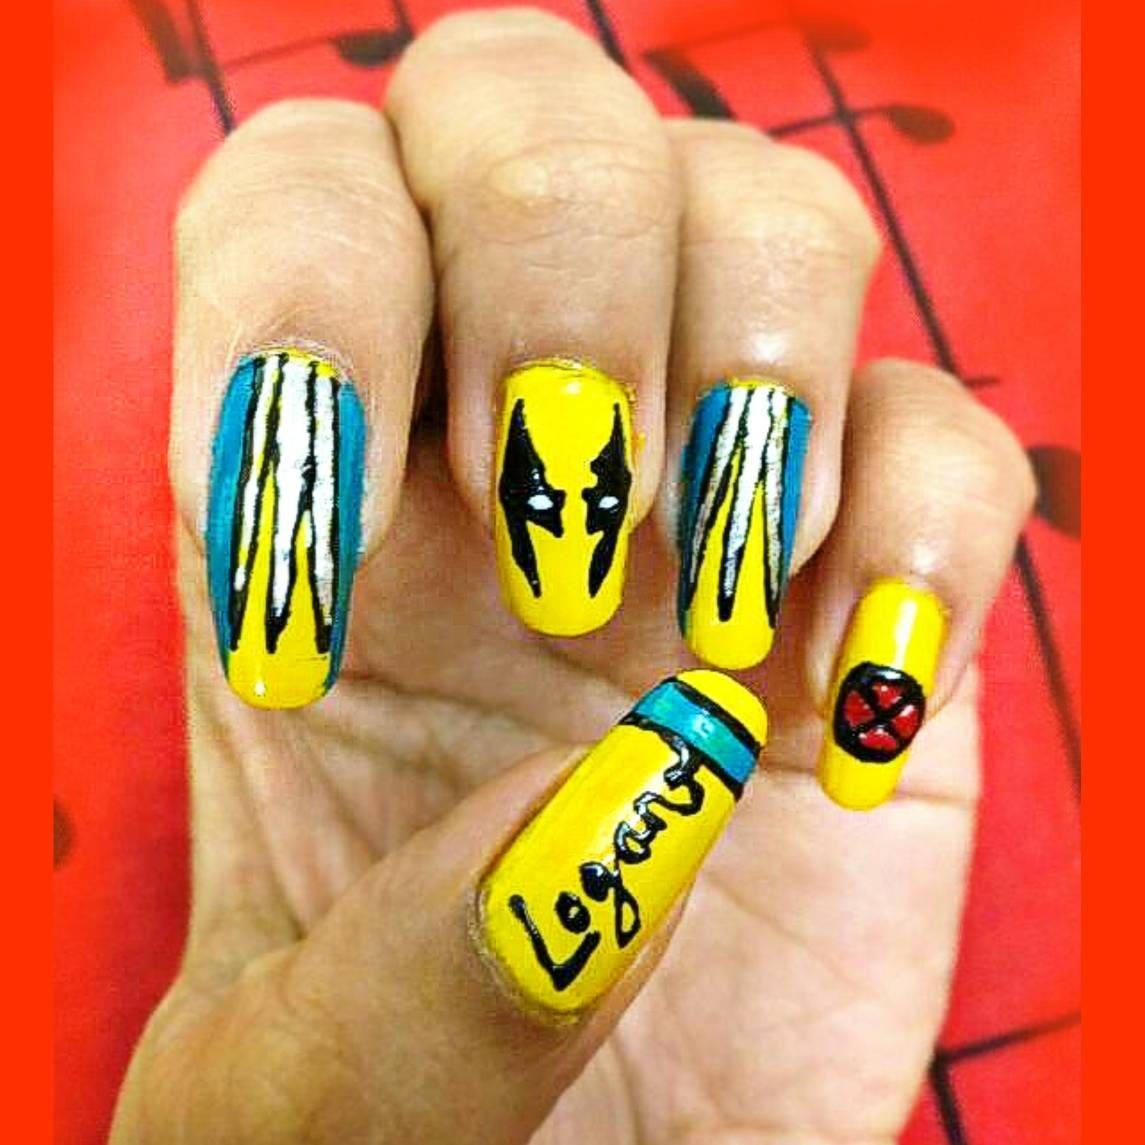 Wolverine nail art, NAIL GLUE FREE, Handpainted nail art, false ...